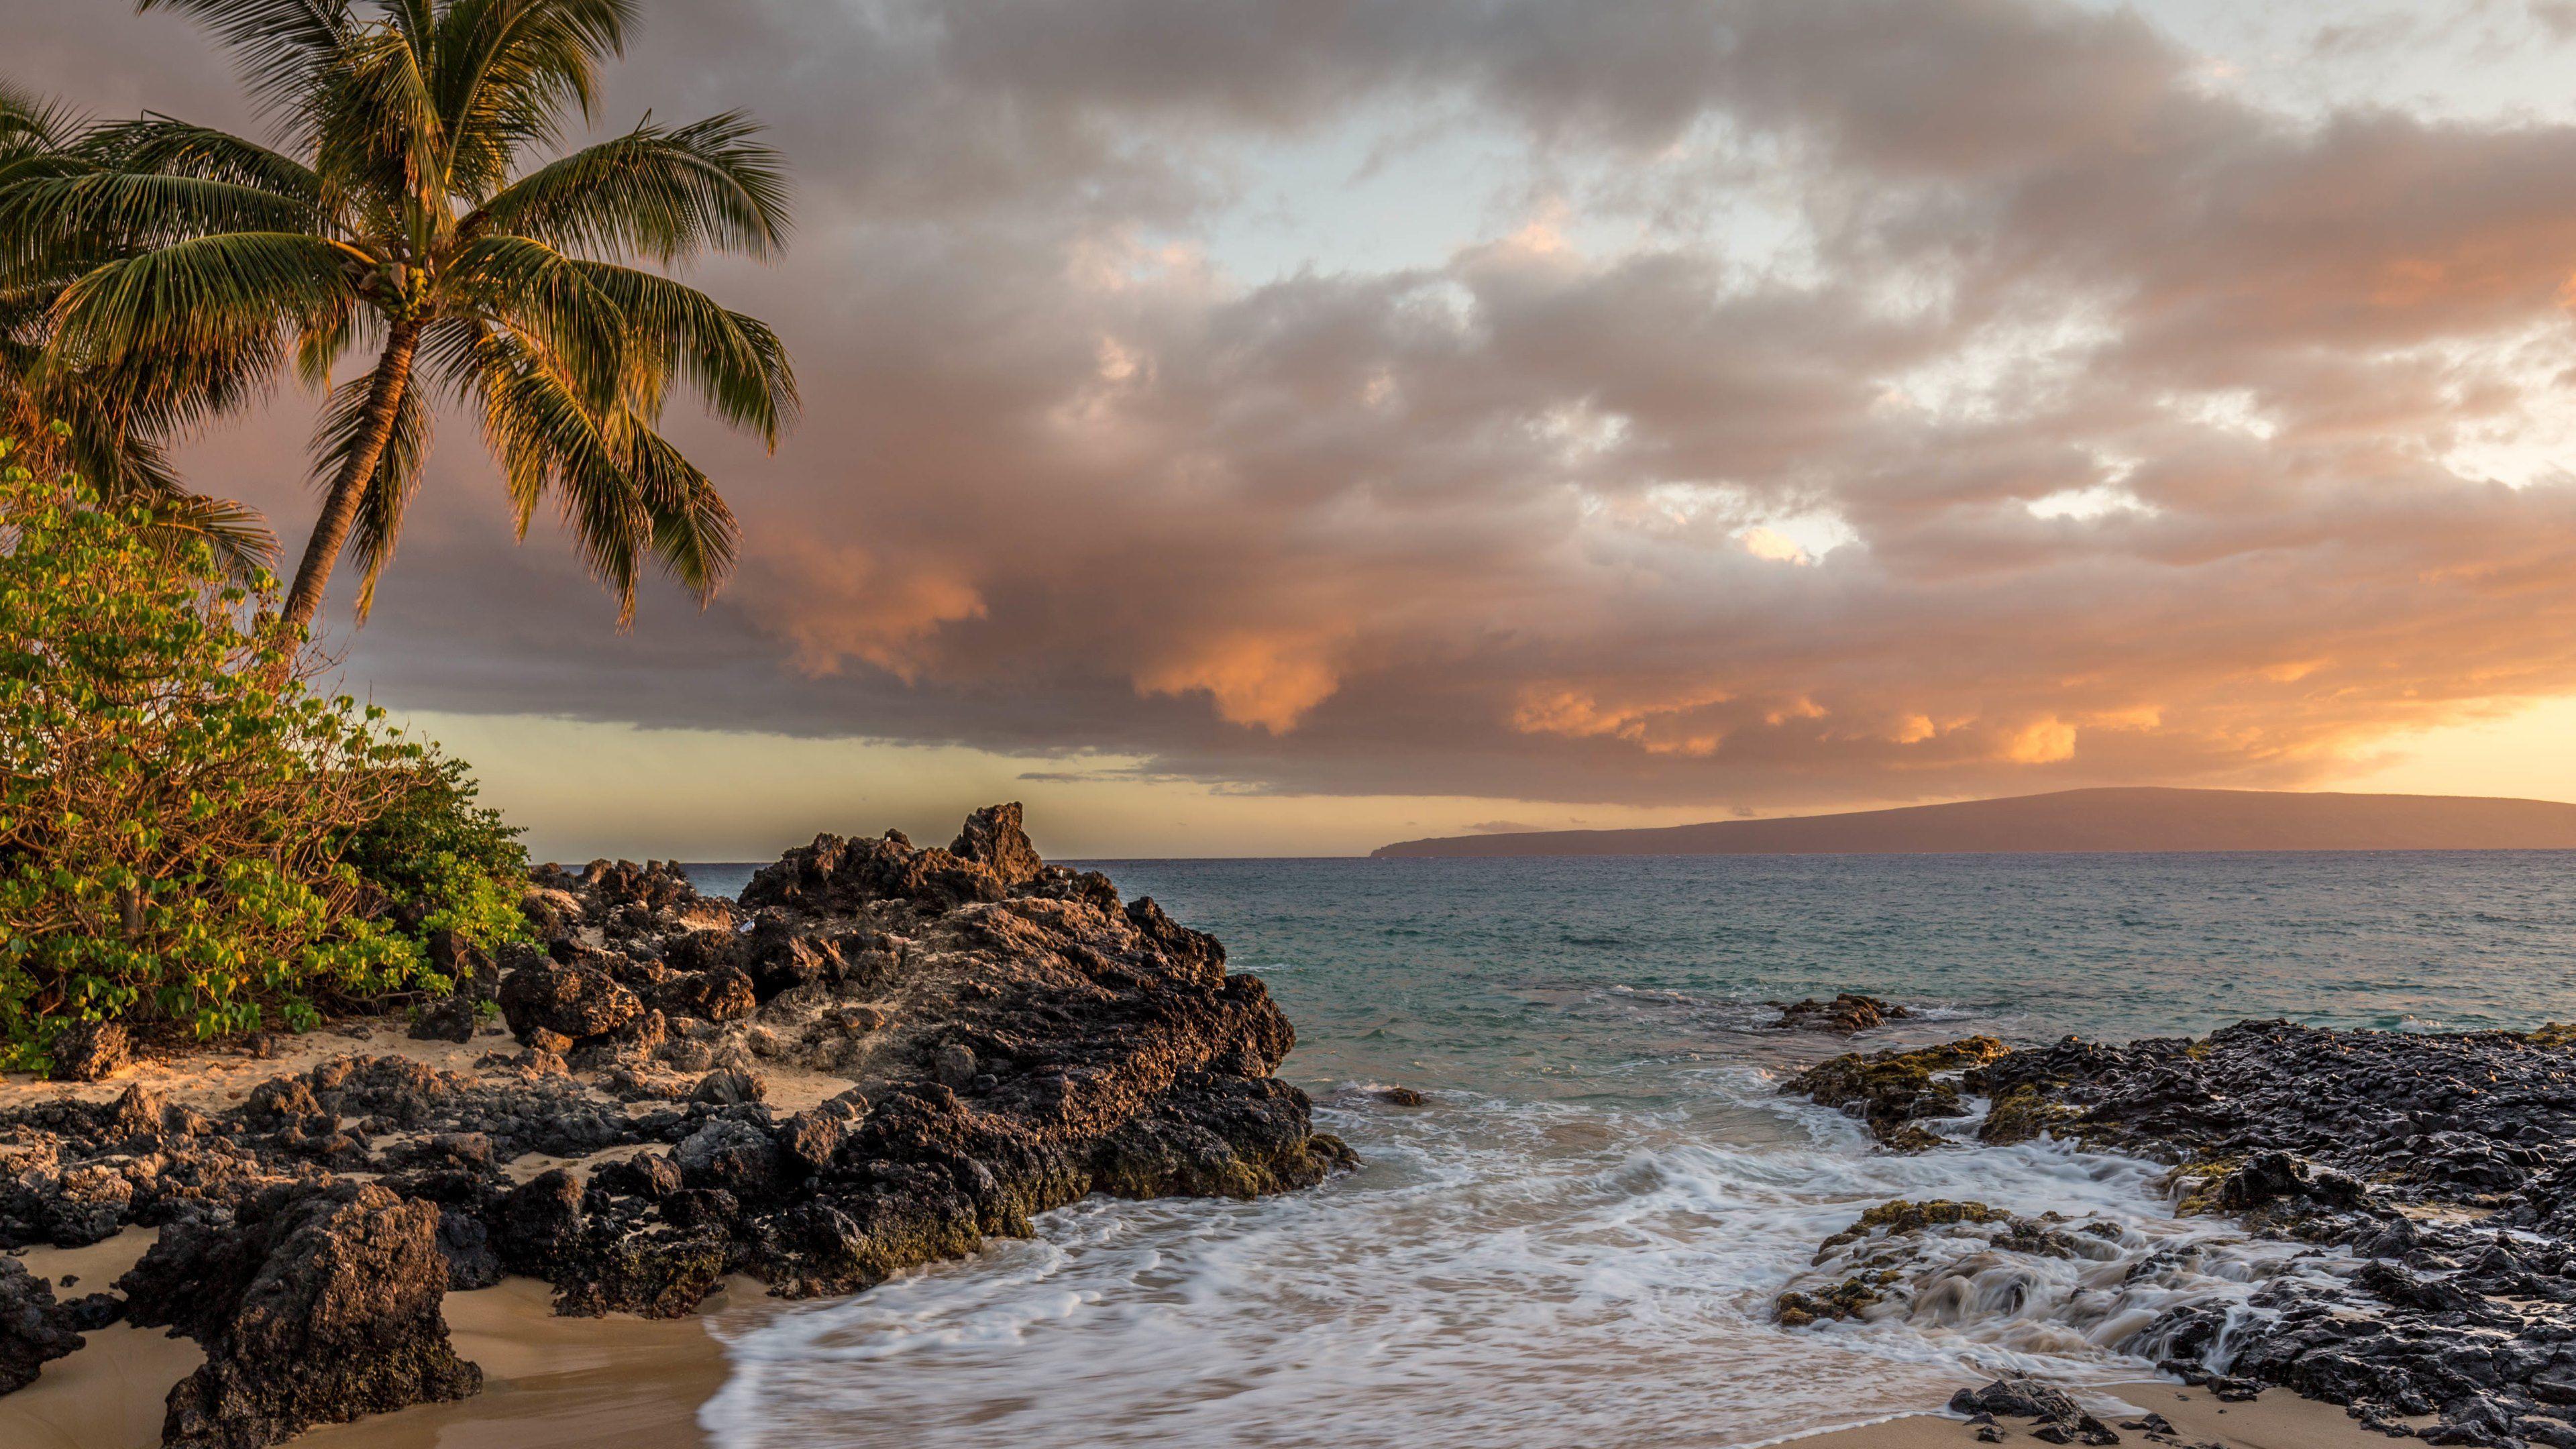 64K Ultra HD Beach Wallpapers - Top Free 64K Ultra HD ...